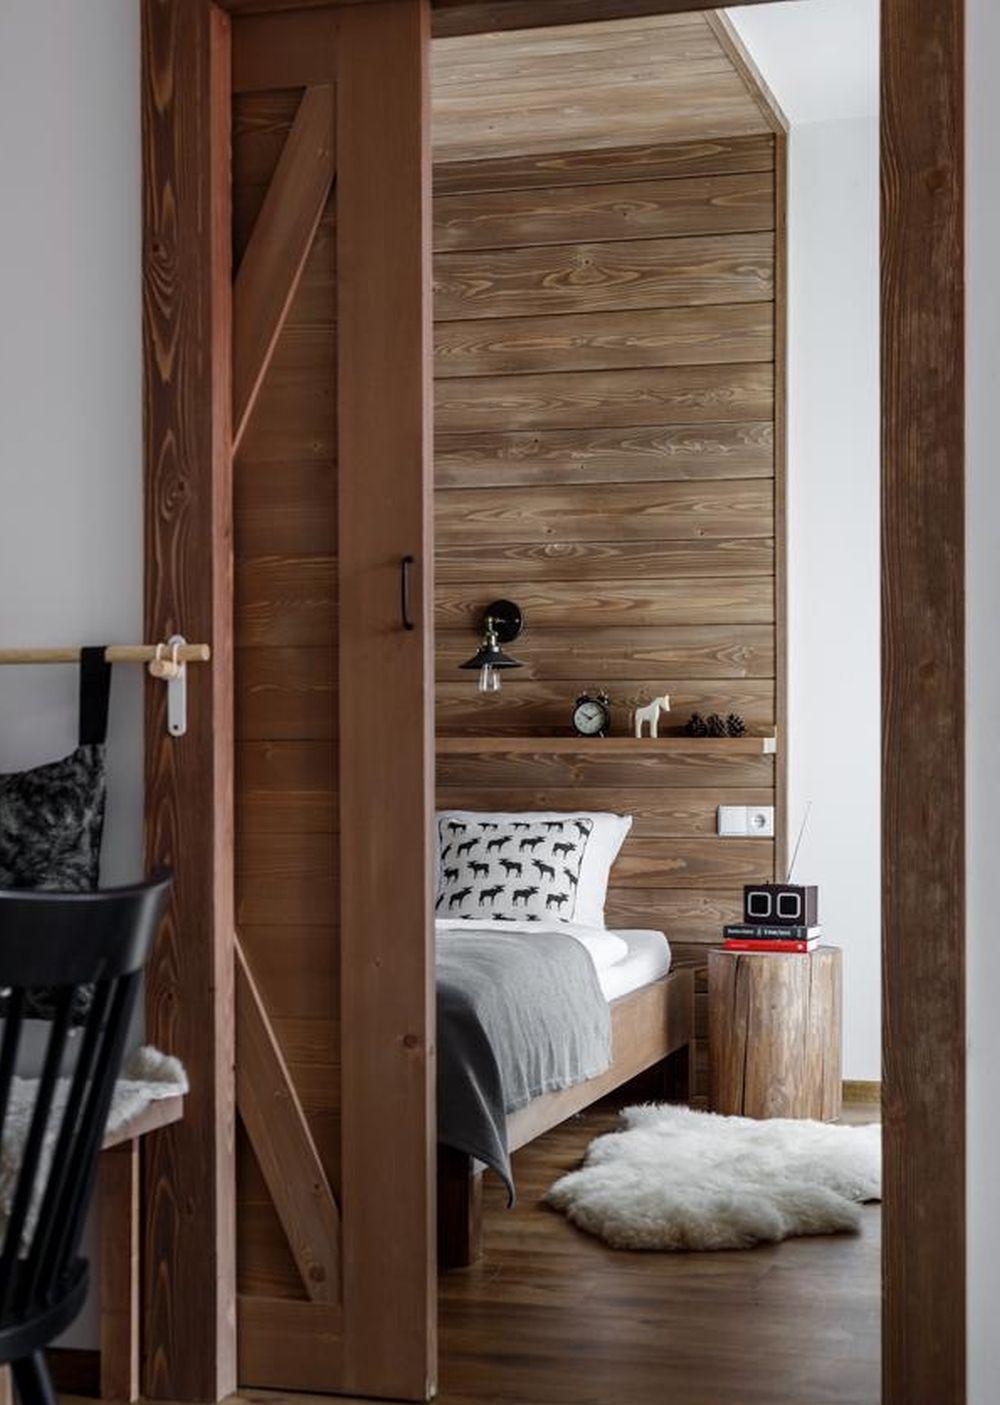 adelaparvu.com despre apartament 2 camere, 46 mp, in stil montan, Polonia, Foto TatryTop (12)